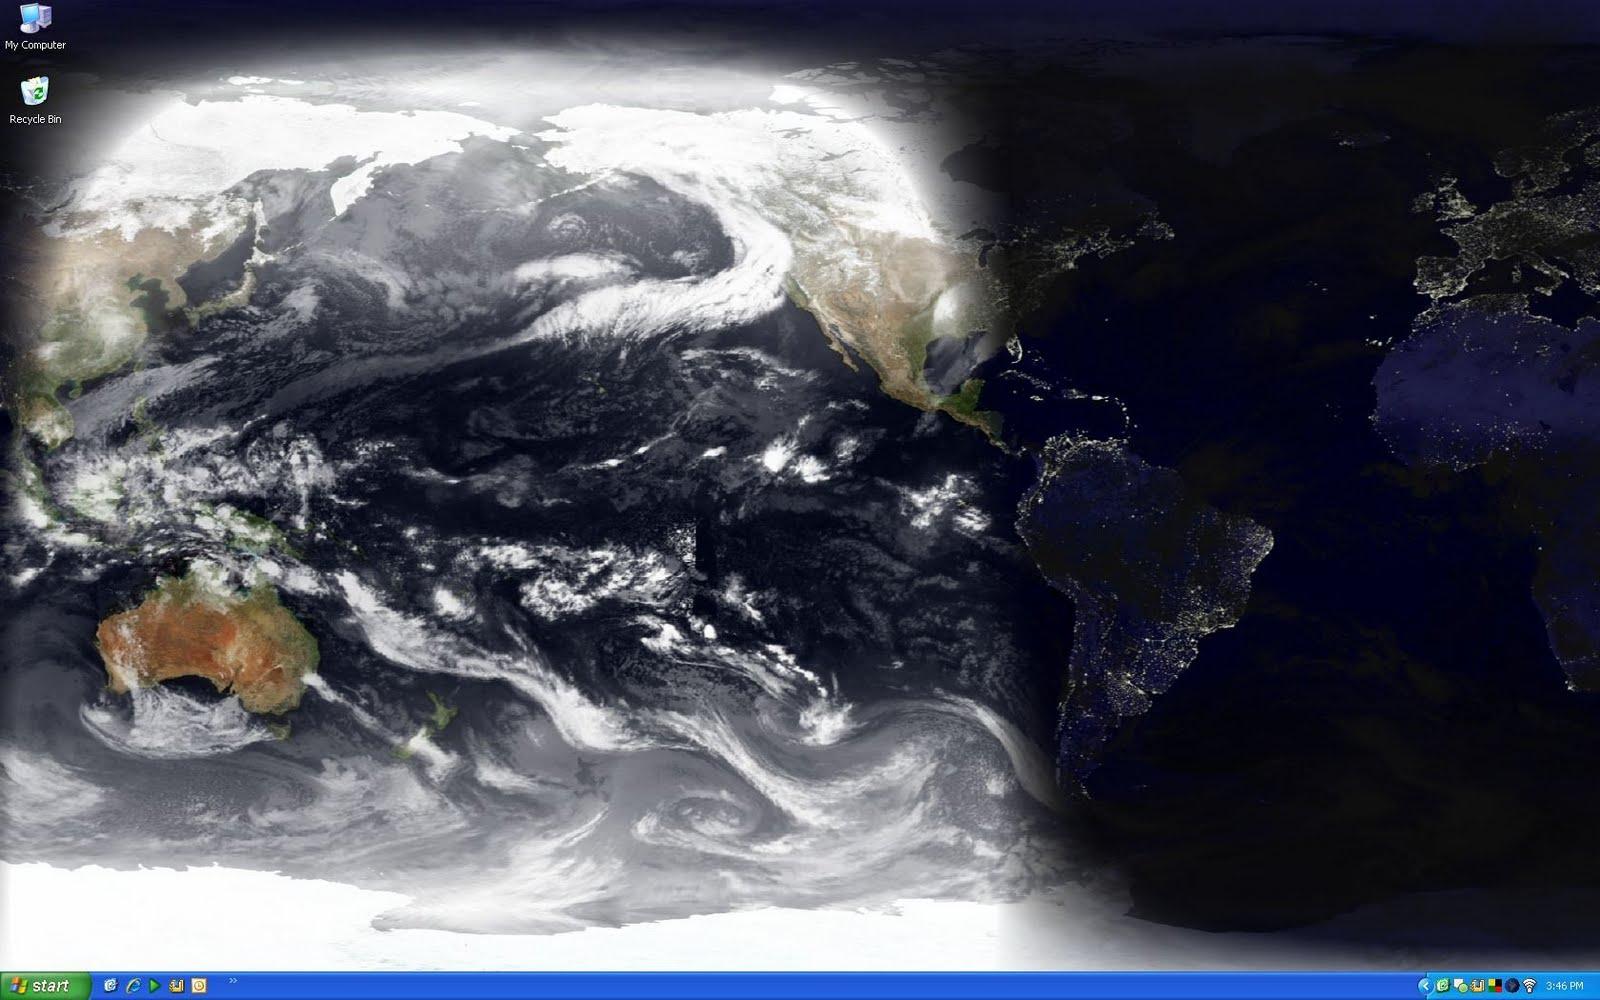 http://1.bp.blogspot.com/_c4ztBE0lSHo/S8wZcIB-PII/AAAAAAAAARE/pSya8R_pPaE/s1600/desktop-earth-screenshot.jpg